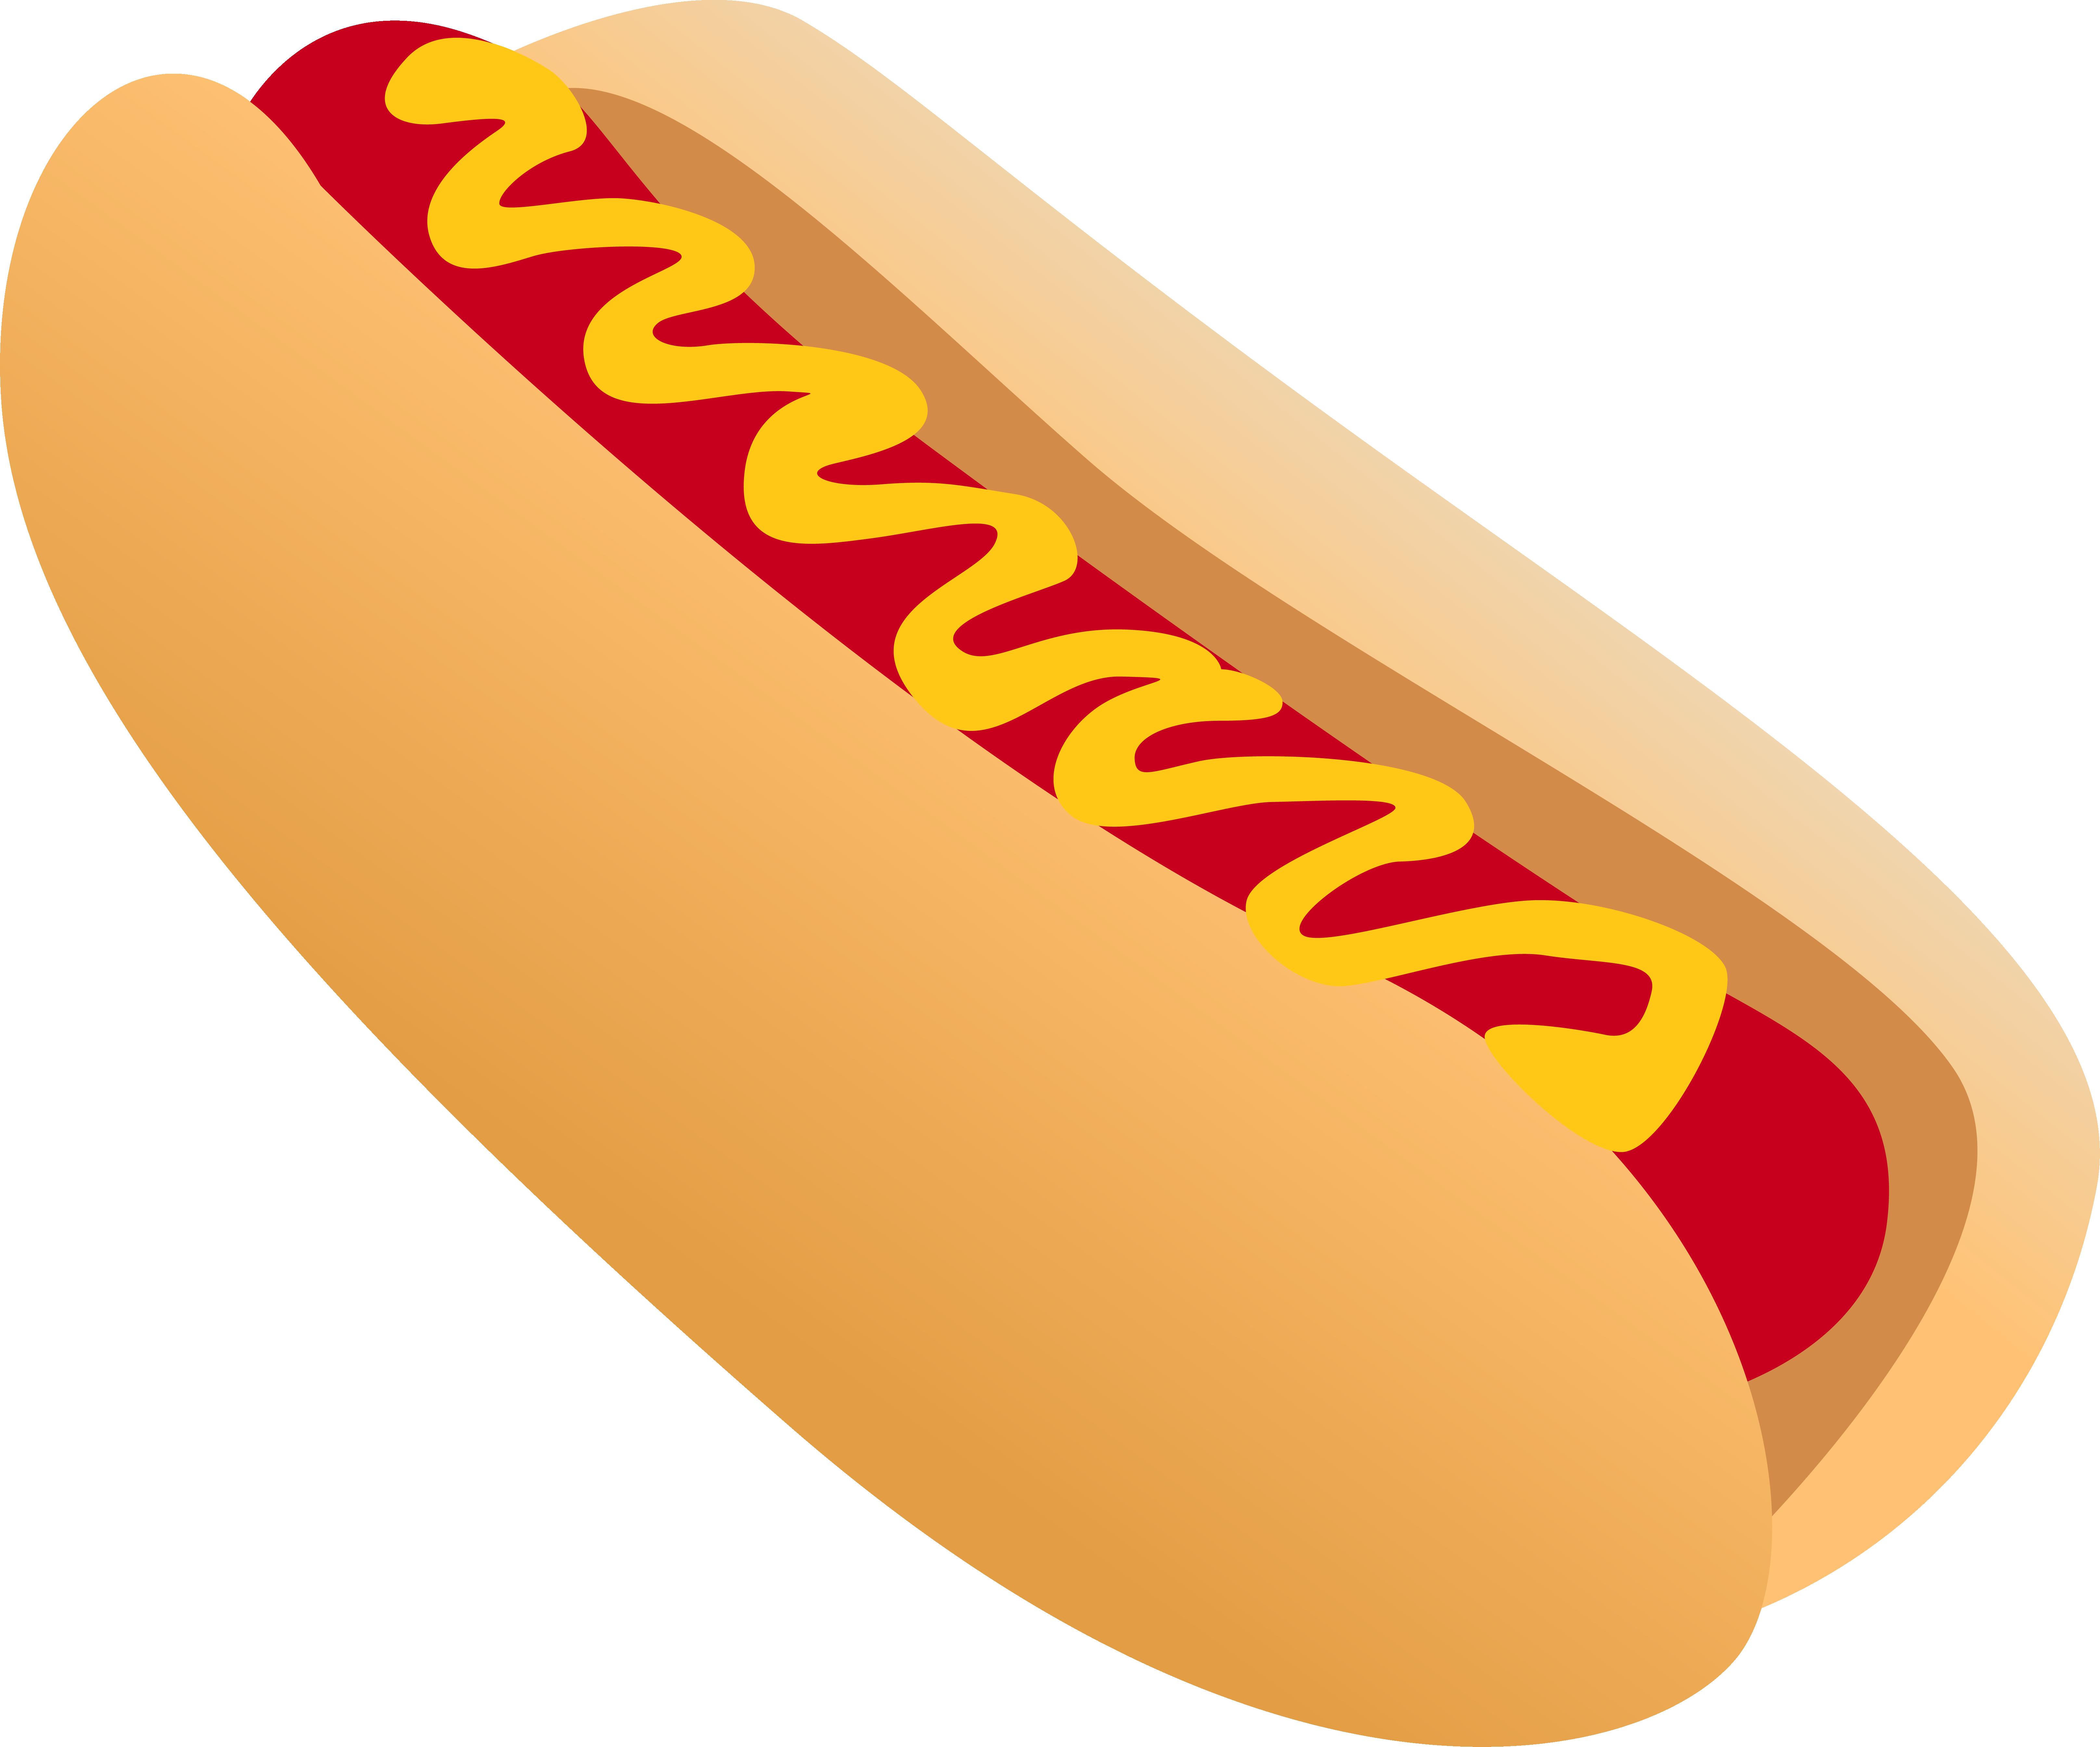 Hot Dog Vector Dog Vector Hot Hot Dogs